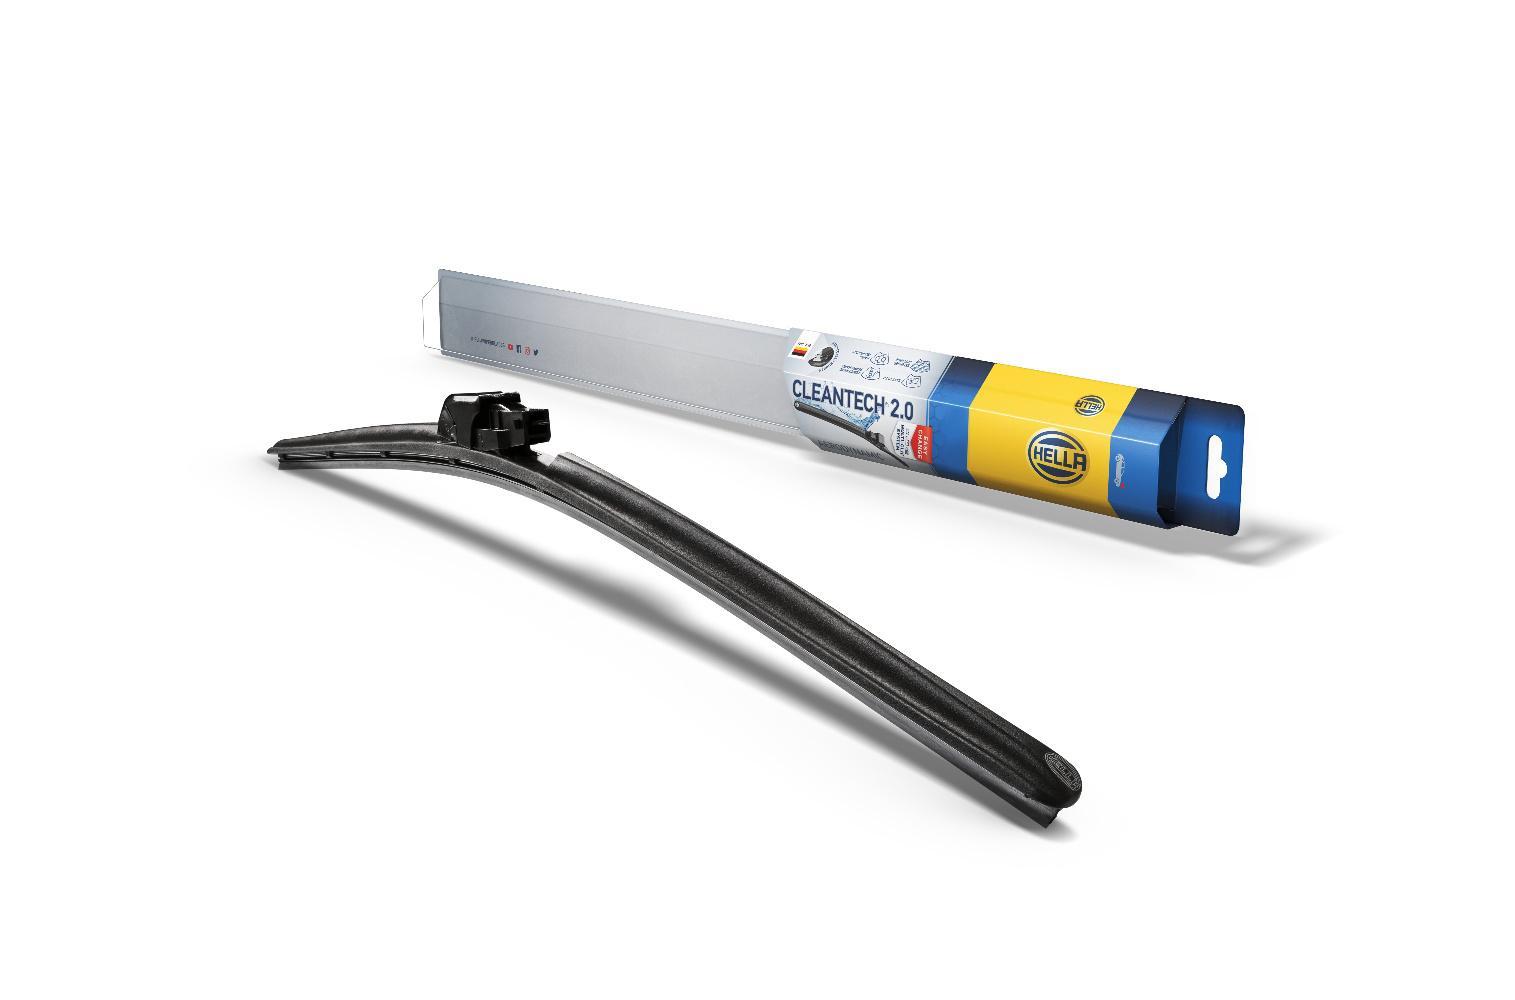 HELLA  9XW 358 061-141 Wiper Blade Left-/right-hand drive vehicles: for right-hand drive vehicles